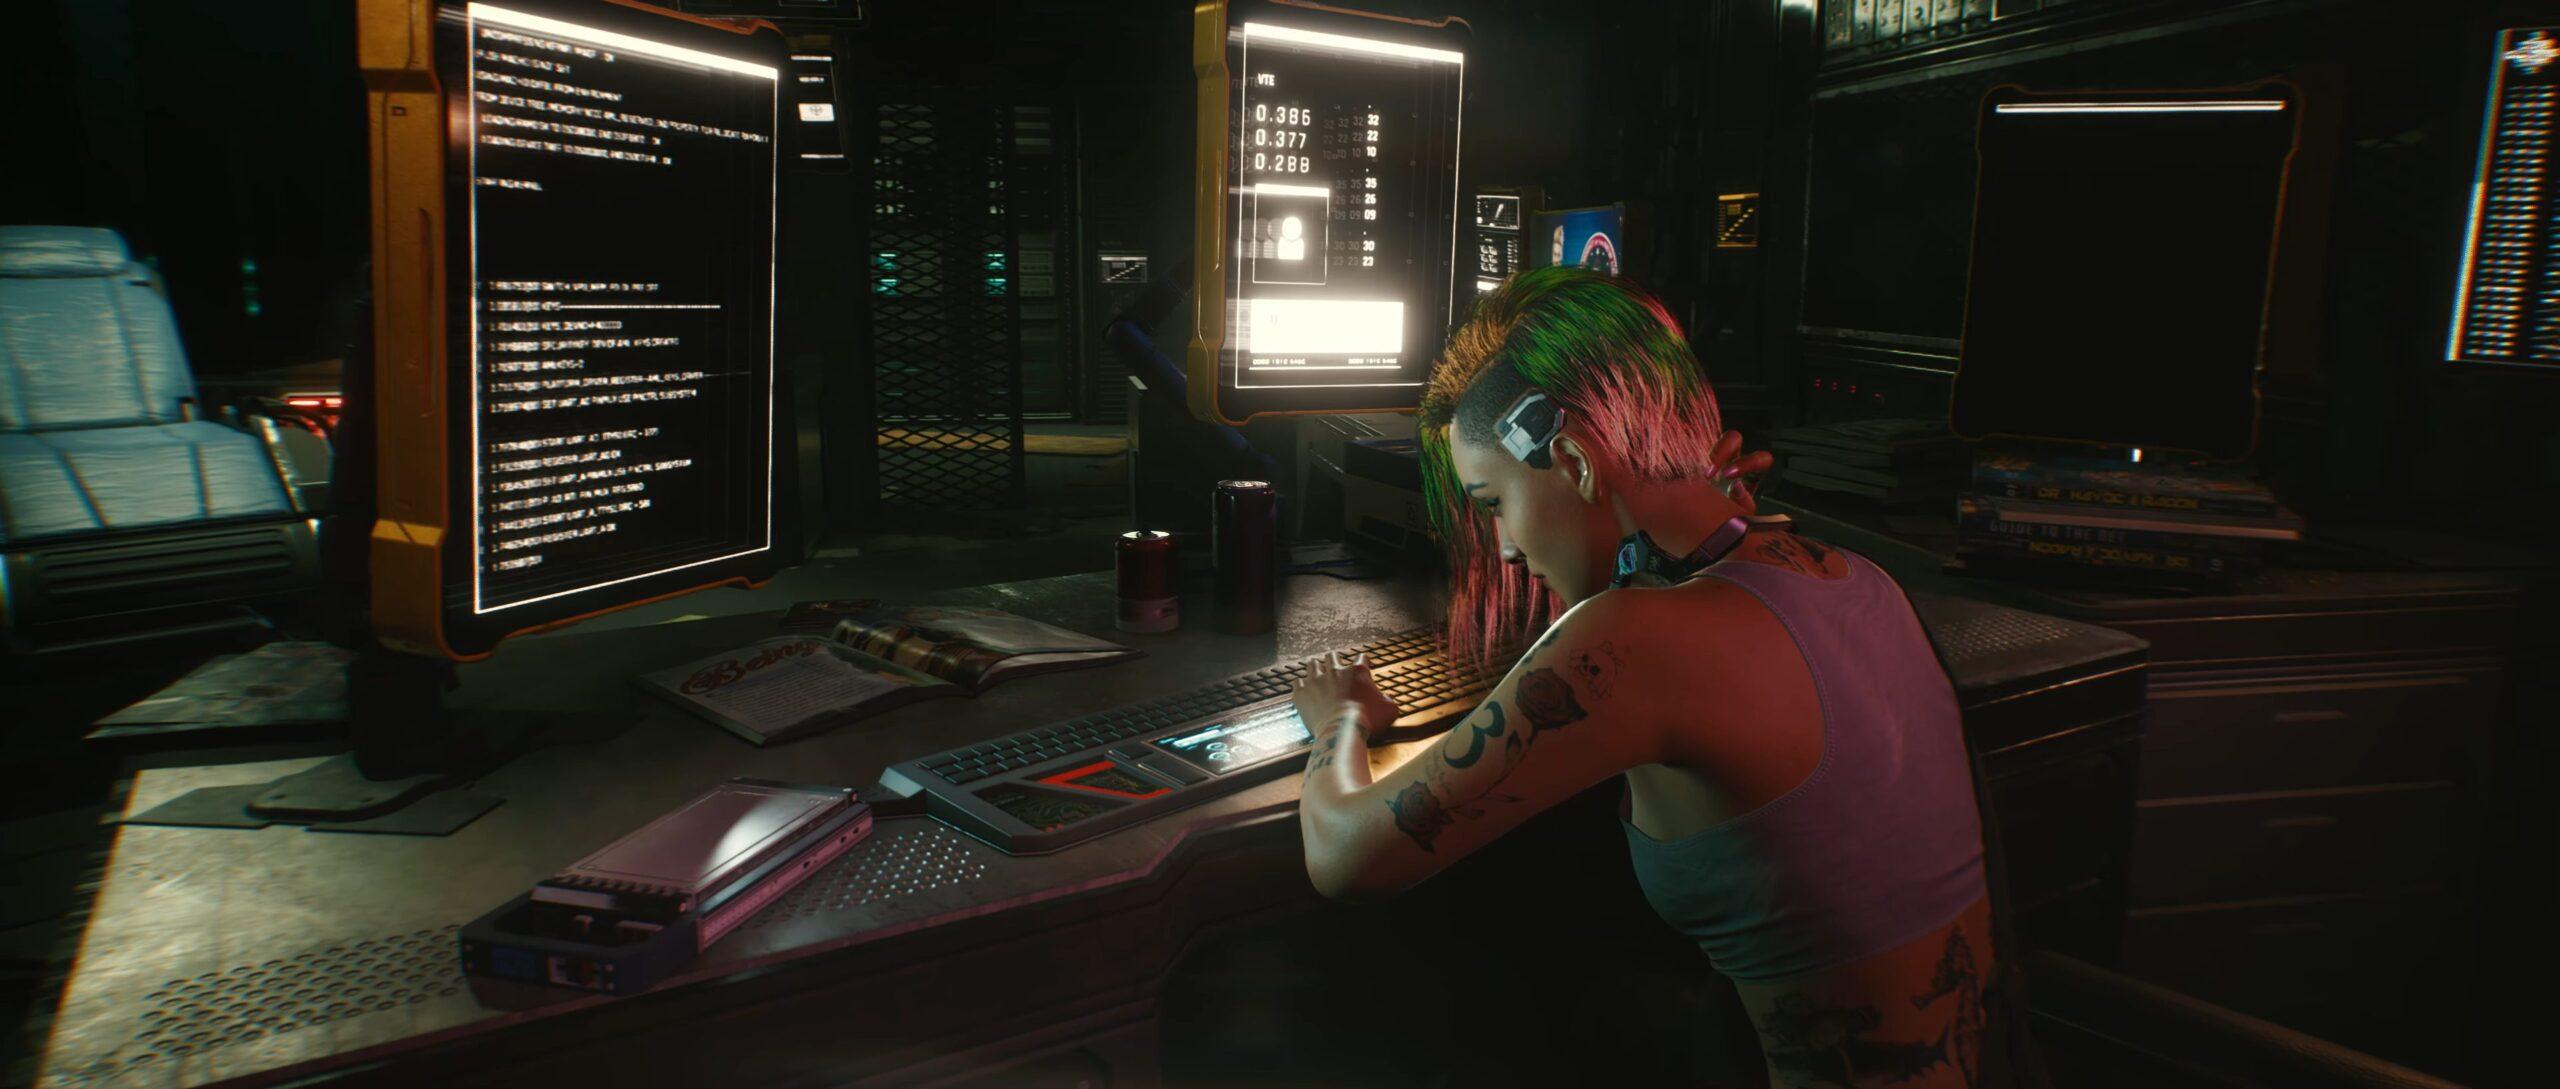 Cyberpunk 2077 crunch for CDPR